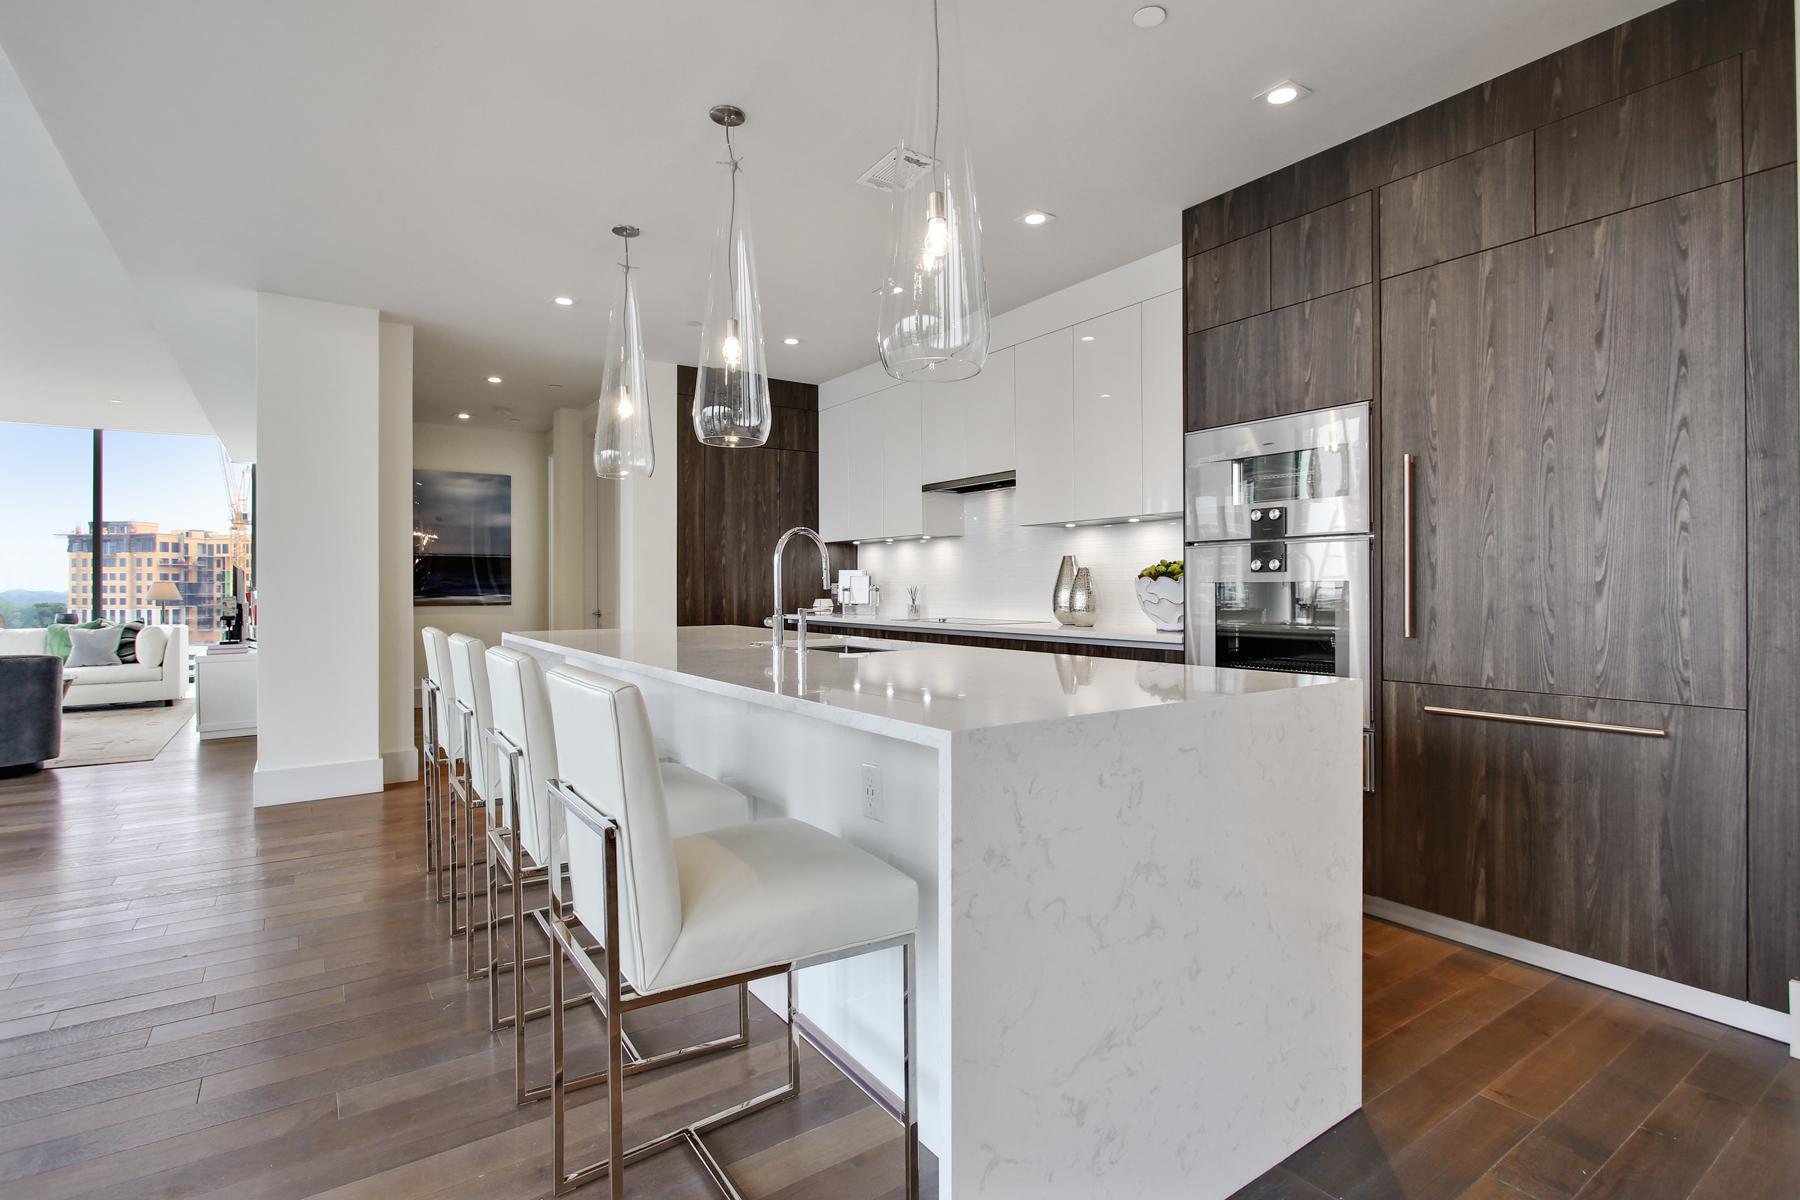 Condominiums для того Продажа на Luxury Condo The Charles 3099 Peachtree Road NE No. 1004, Atlanta, Джорджия 30305 Соединенные Штаты